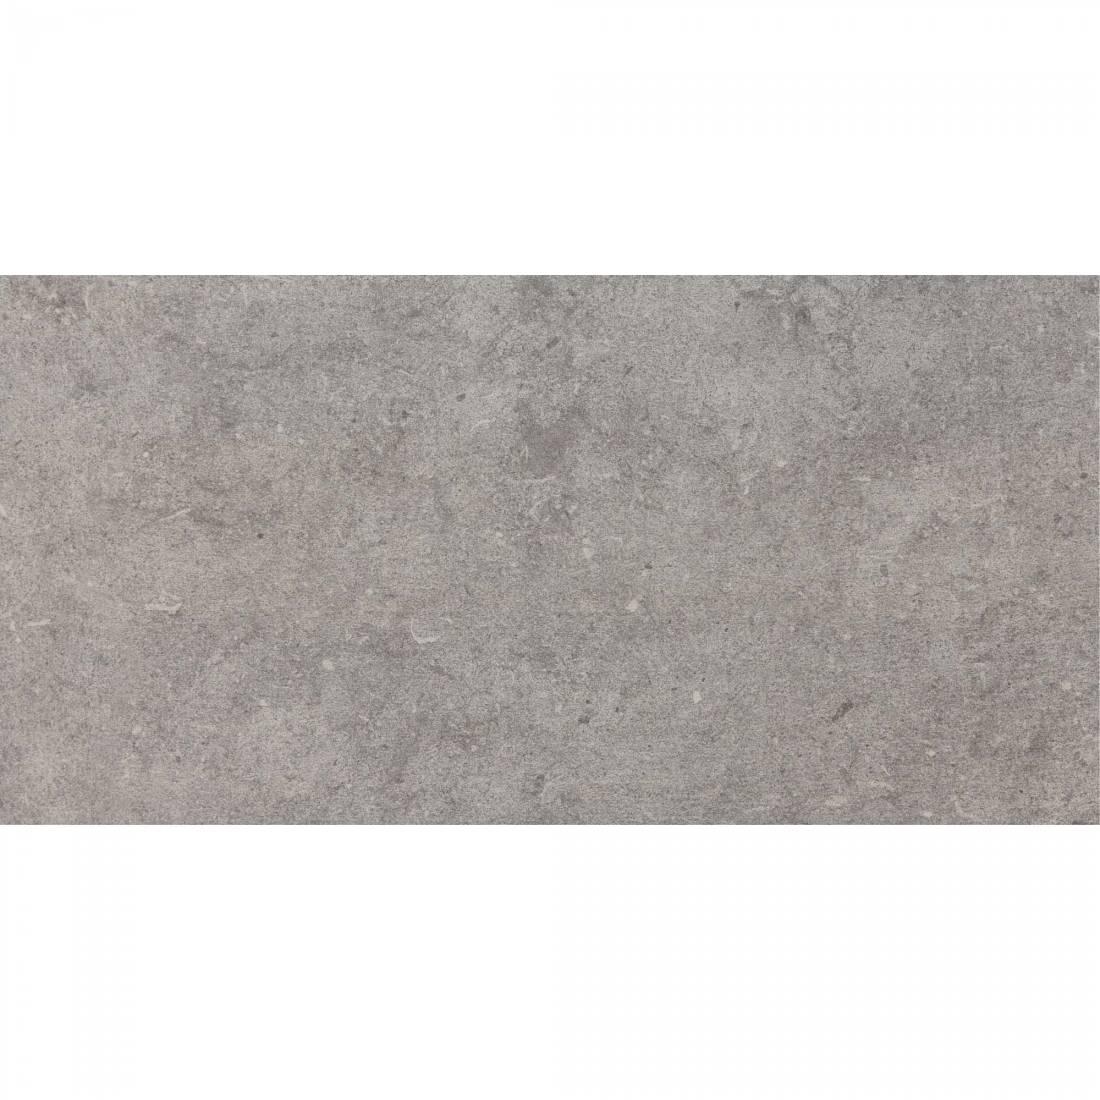 Erva 33x66 Grey Matt 1